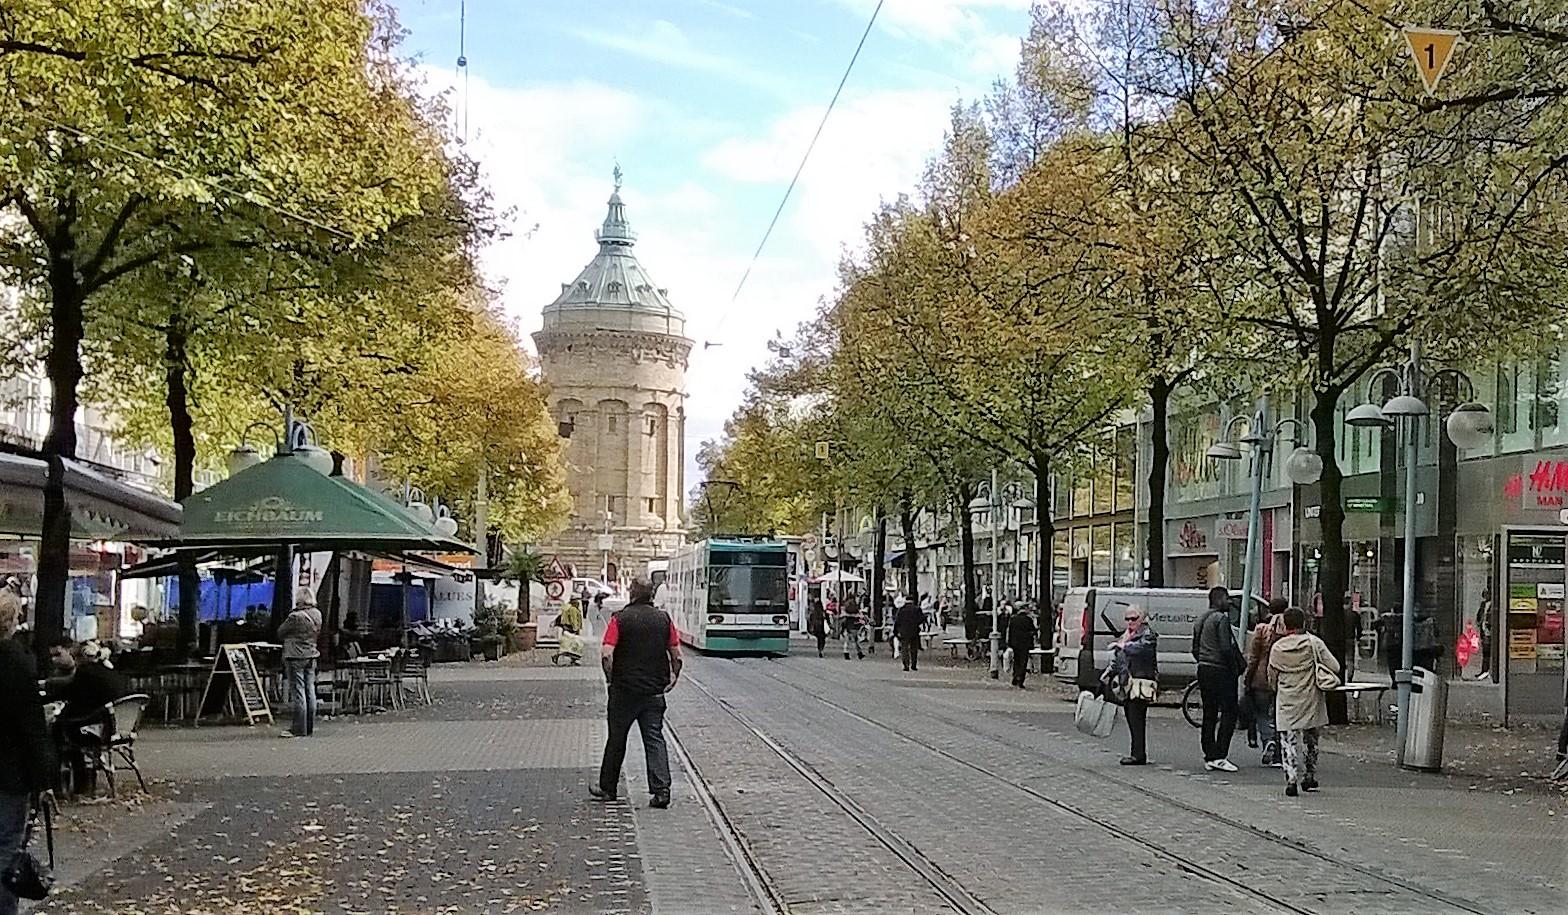 Mannheim Shopping then Munich, Germany